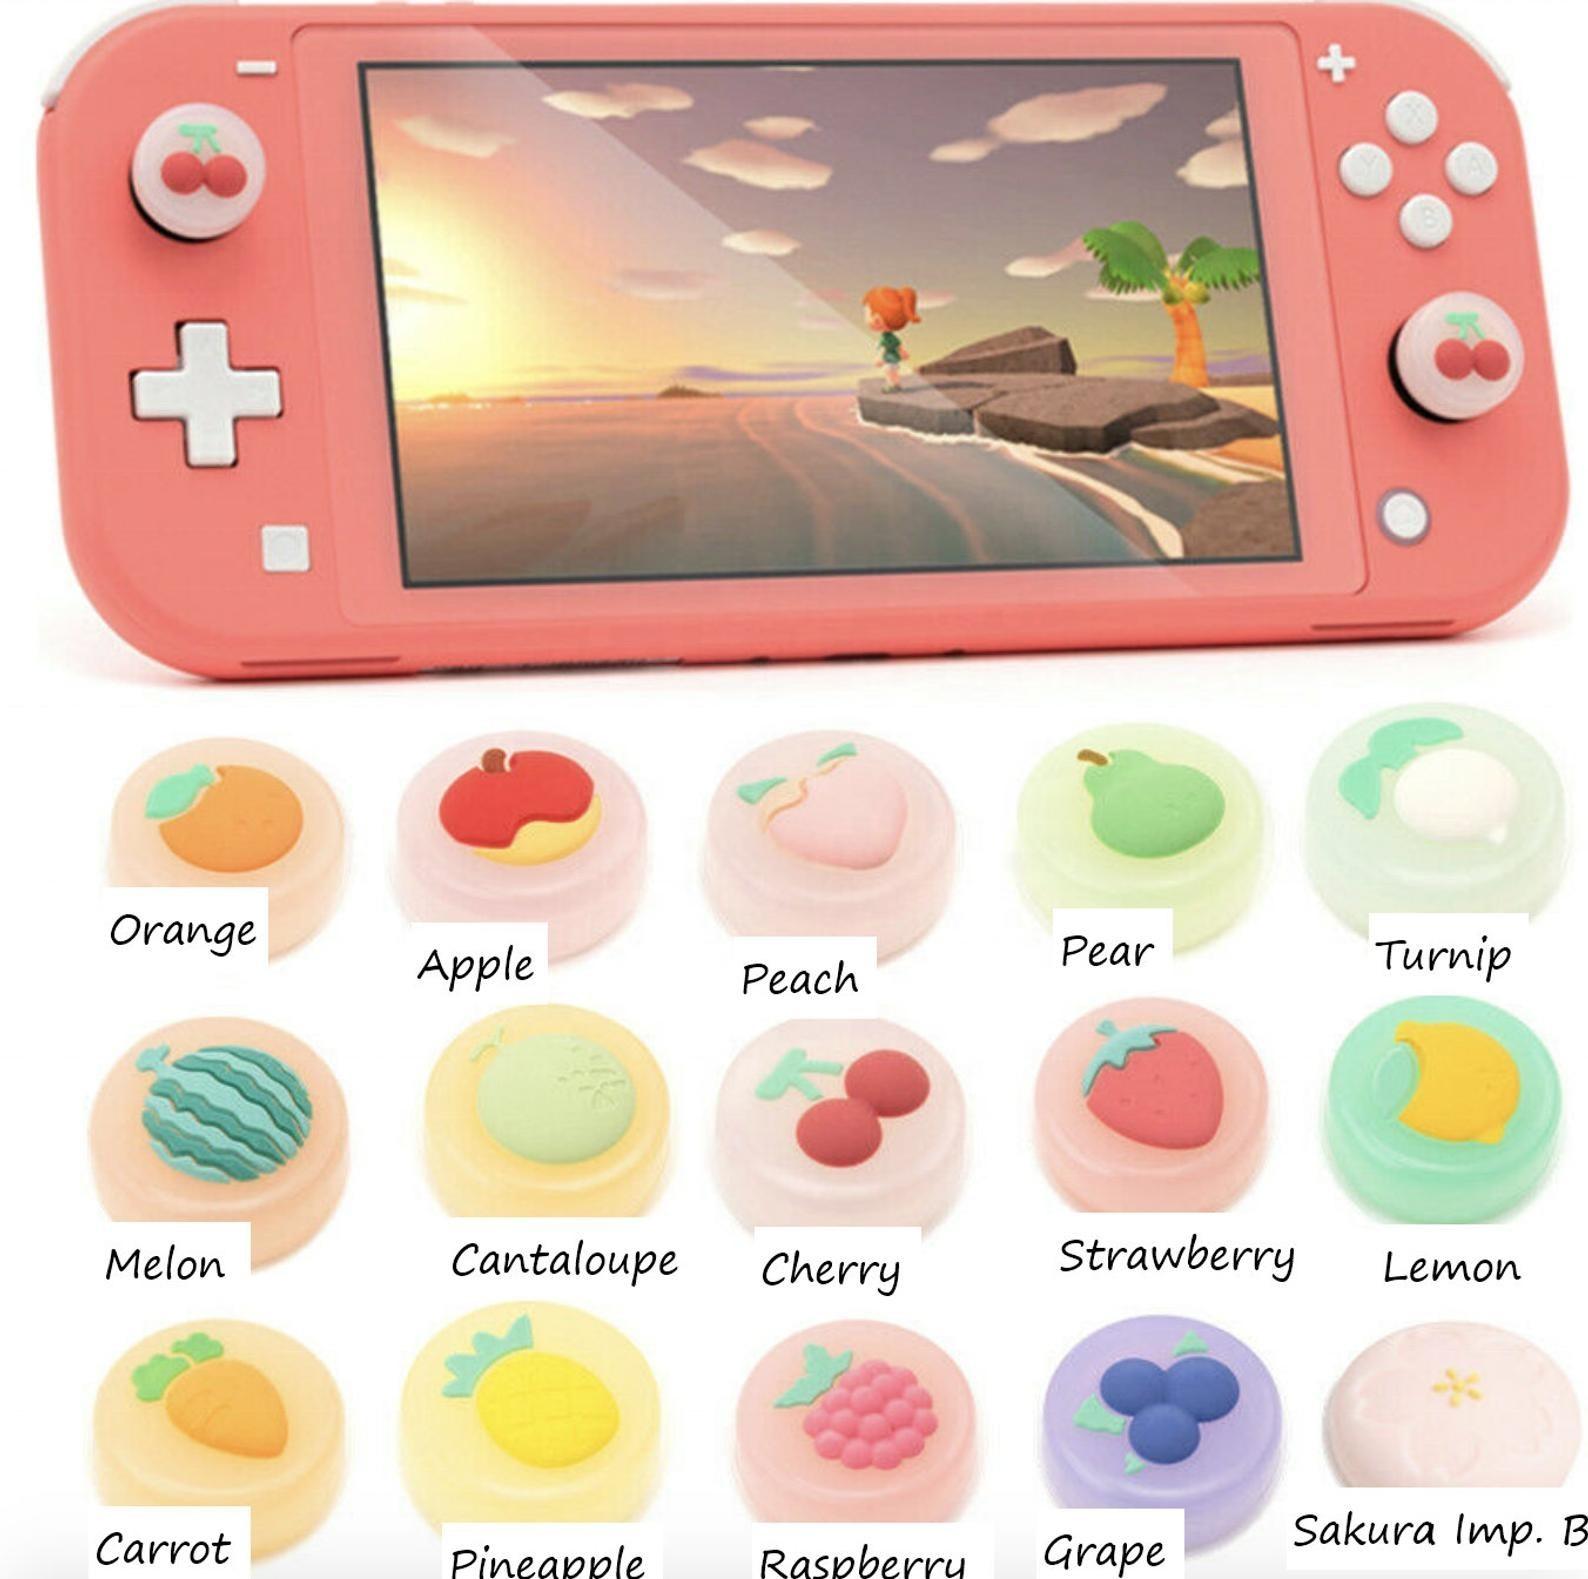 Nintendo Switch Lite with 15 various joystick caps underneath